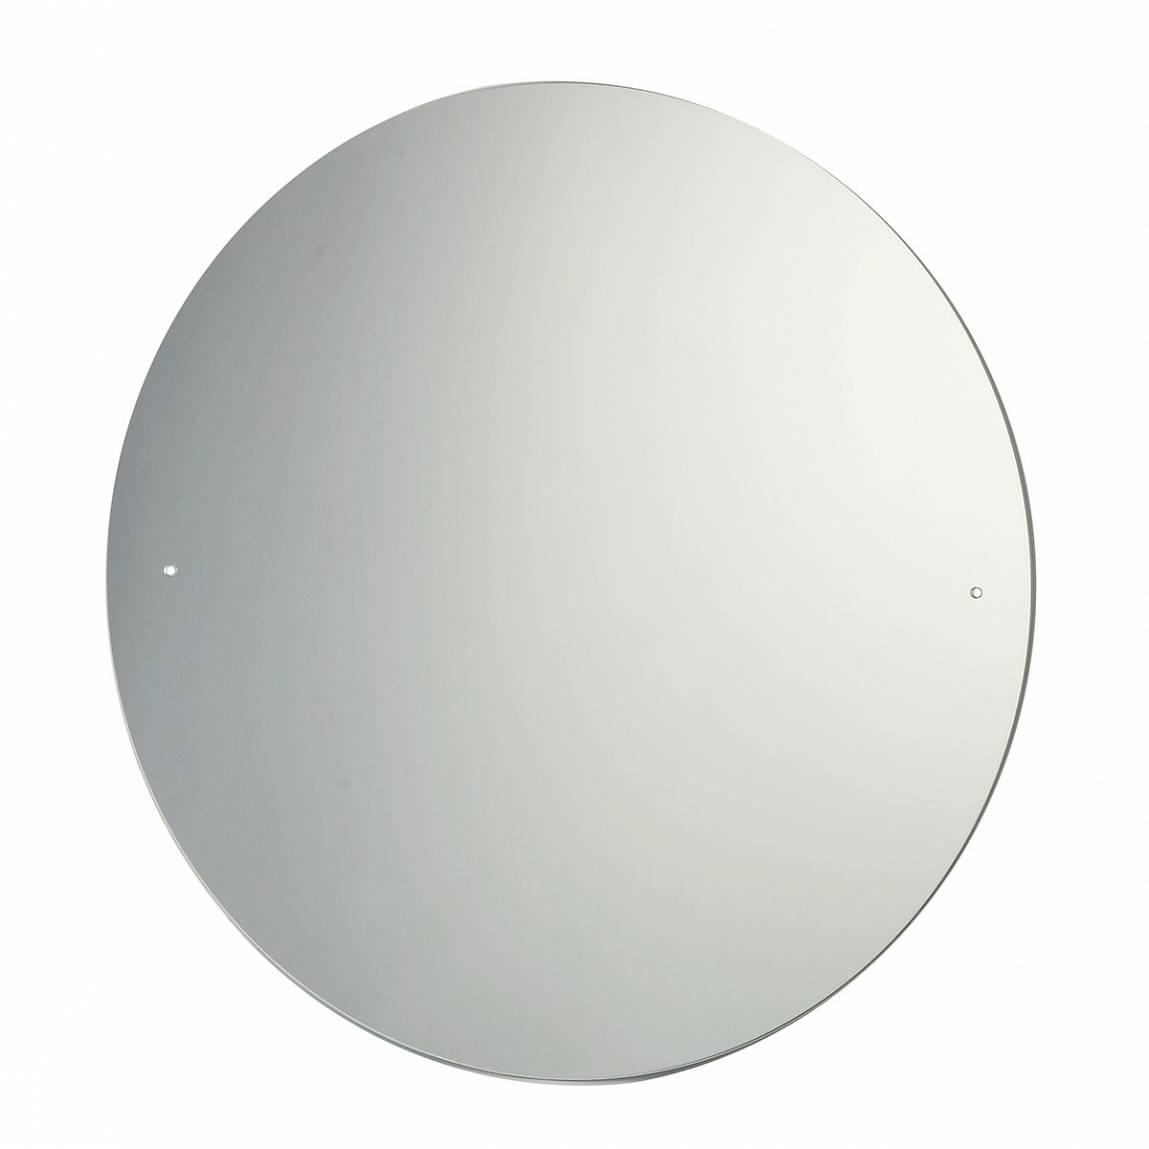 Image of Circular Drilled Mirror Diameter 60cm